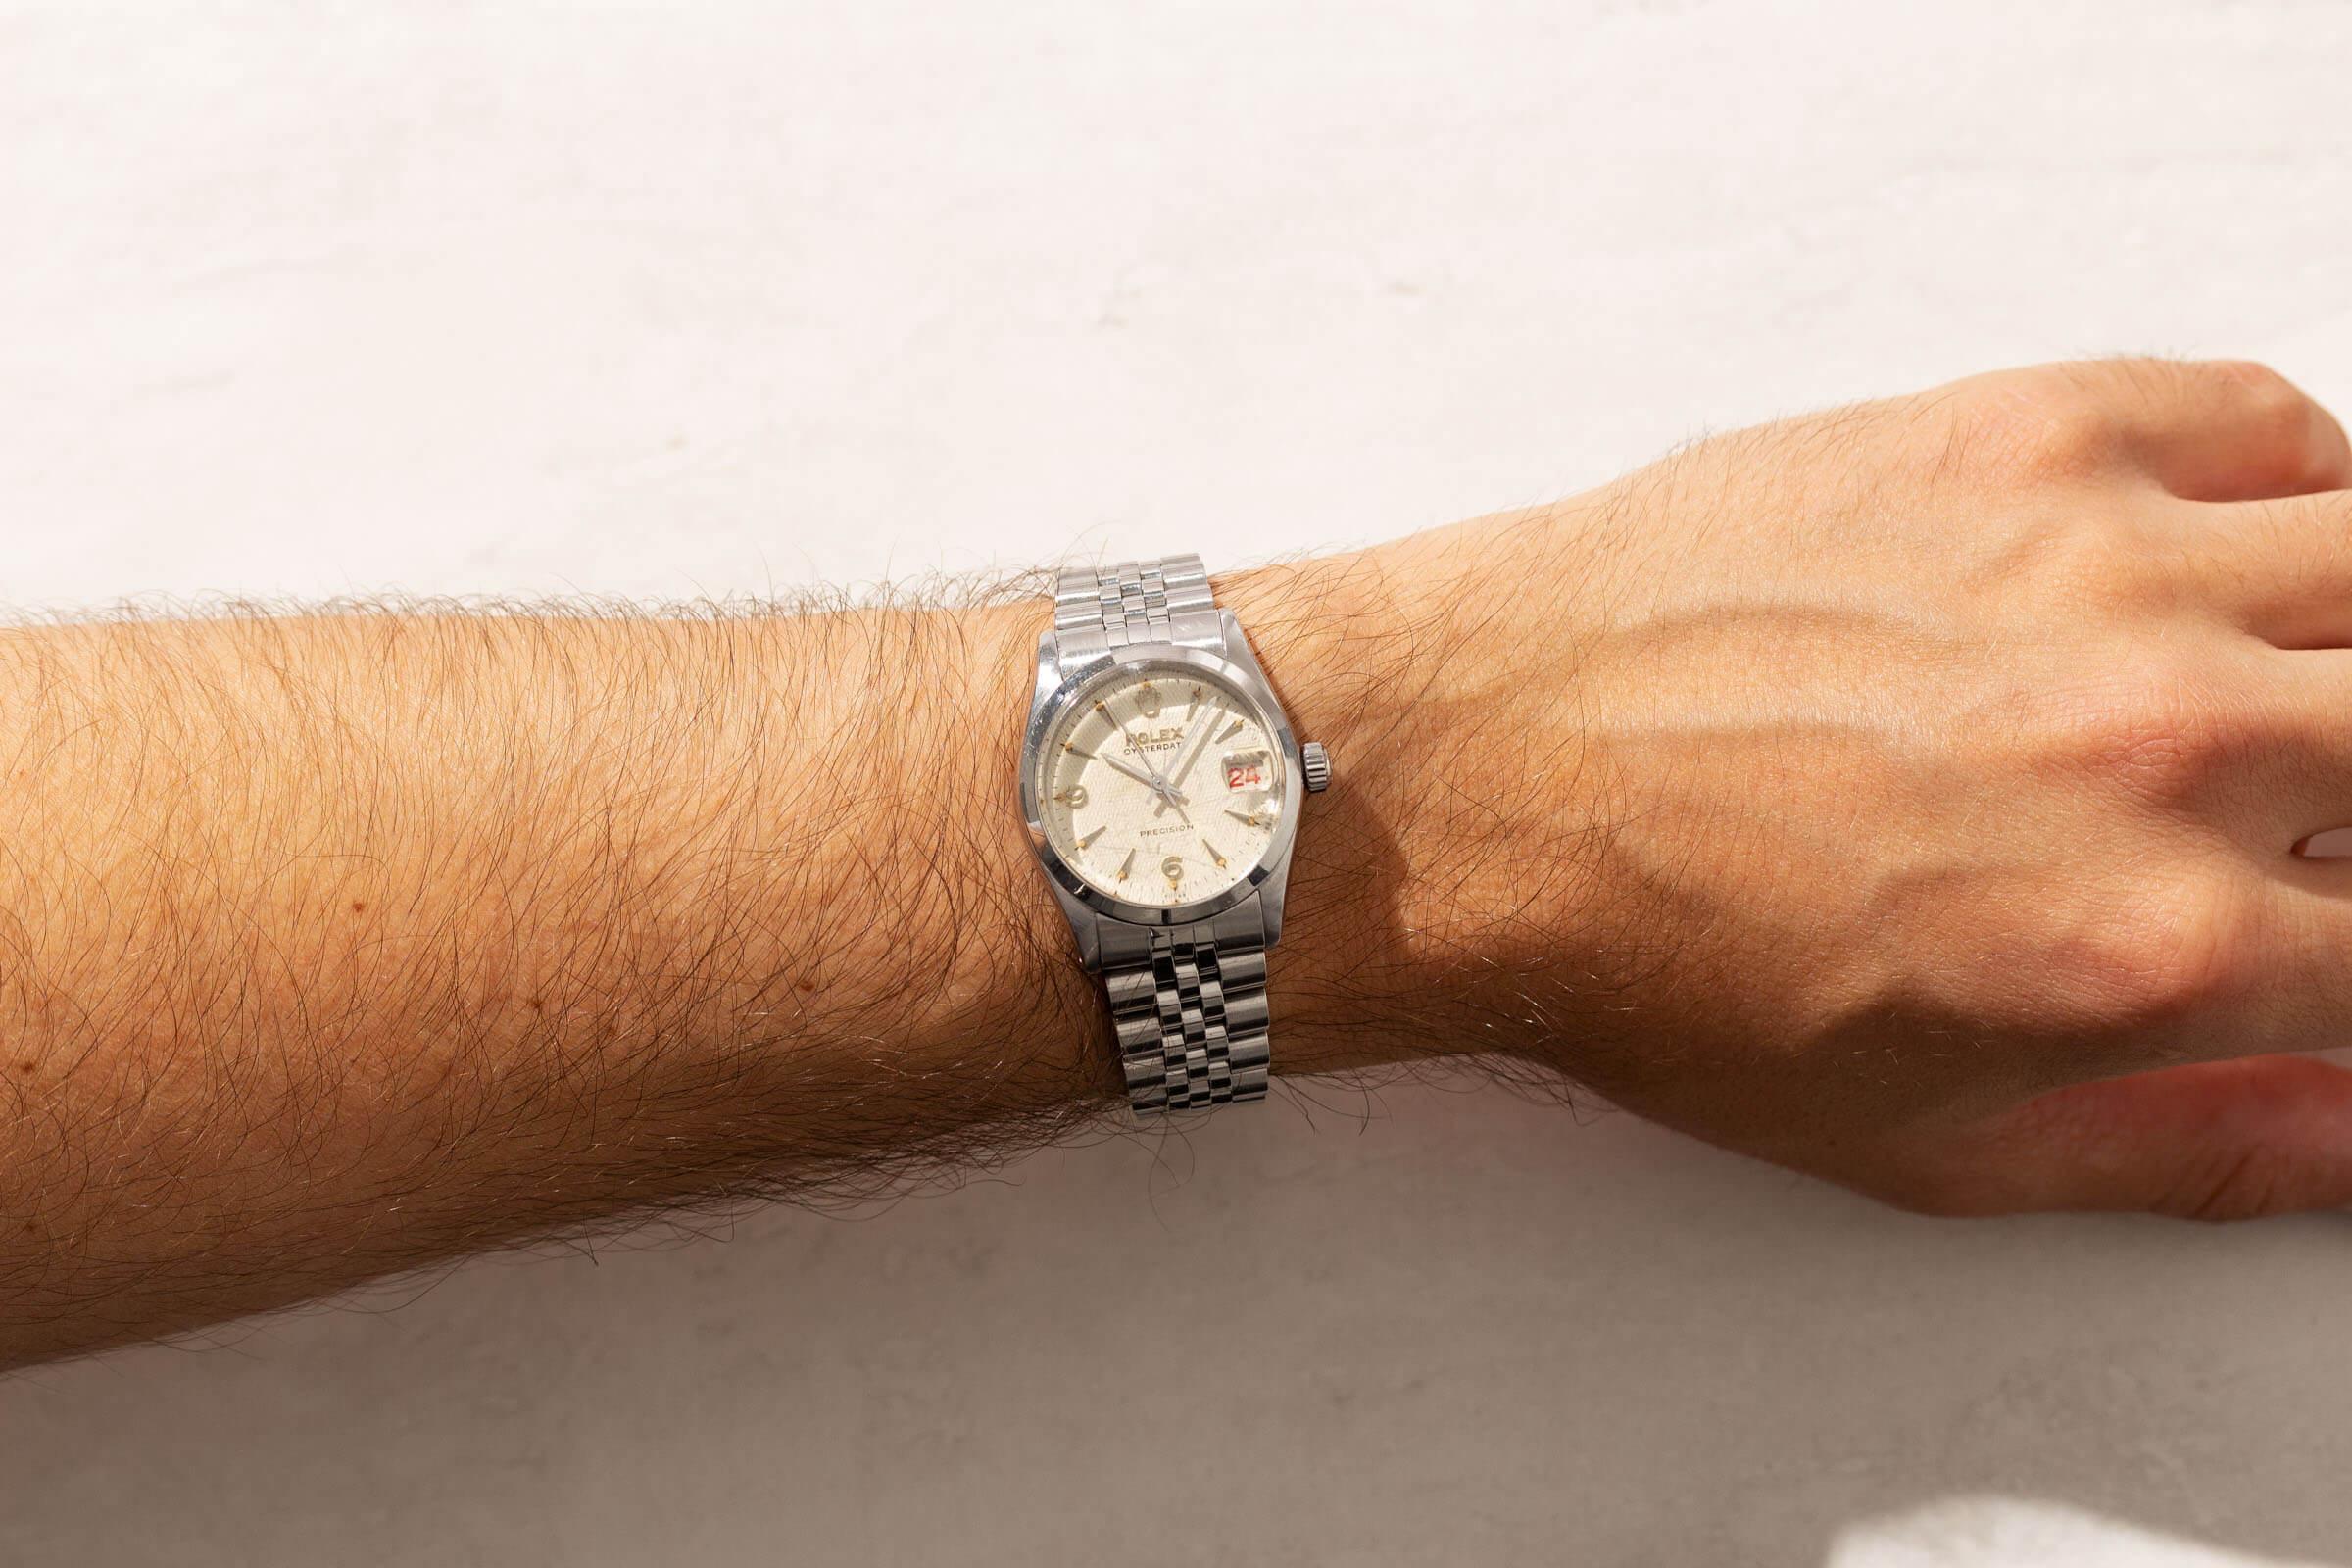 Vintage-Rolex-Date-Oyster